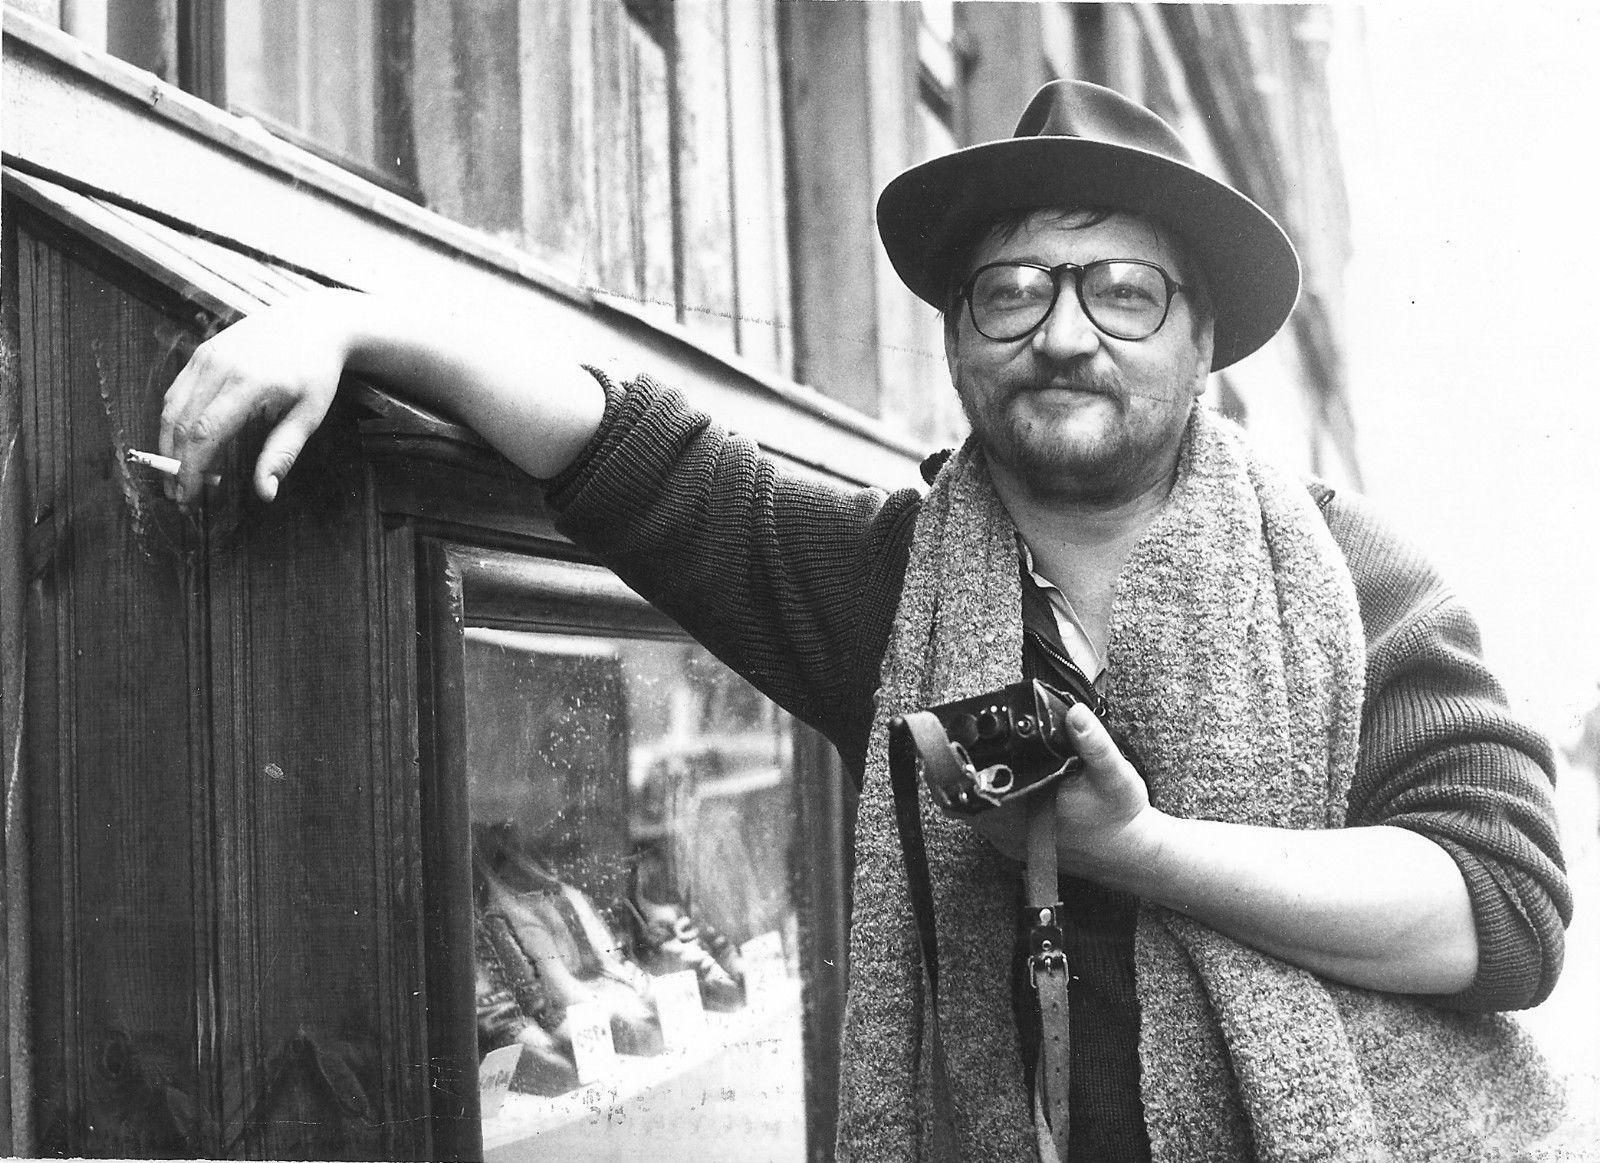 Photo Originale Rainer Werner Fassbinder Tournage Berlin Alexanderplatz Panama Hat Photo Berlin